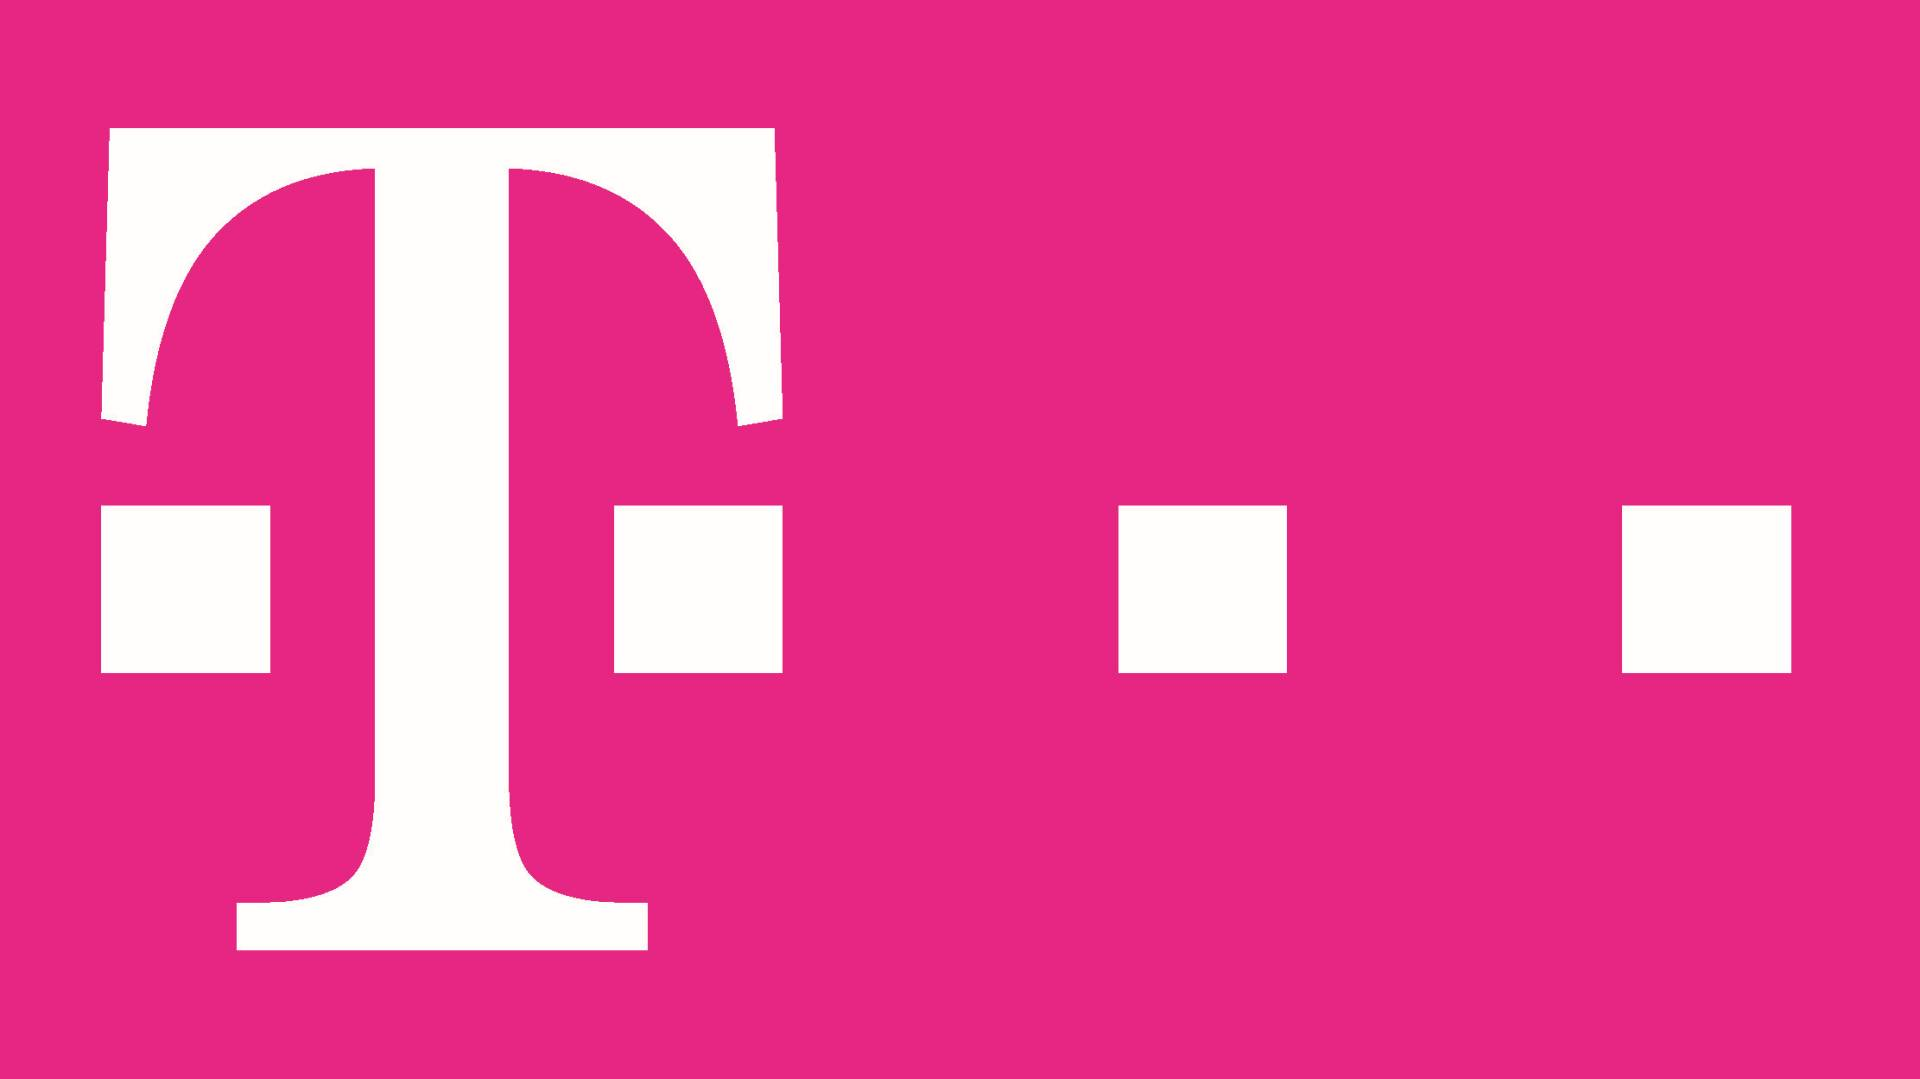 Telekom Romania Continua sa PIARDA CLIENTI in Ambele Divizii